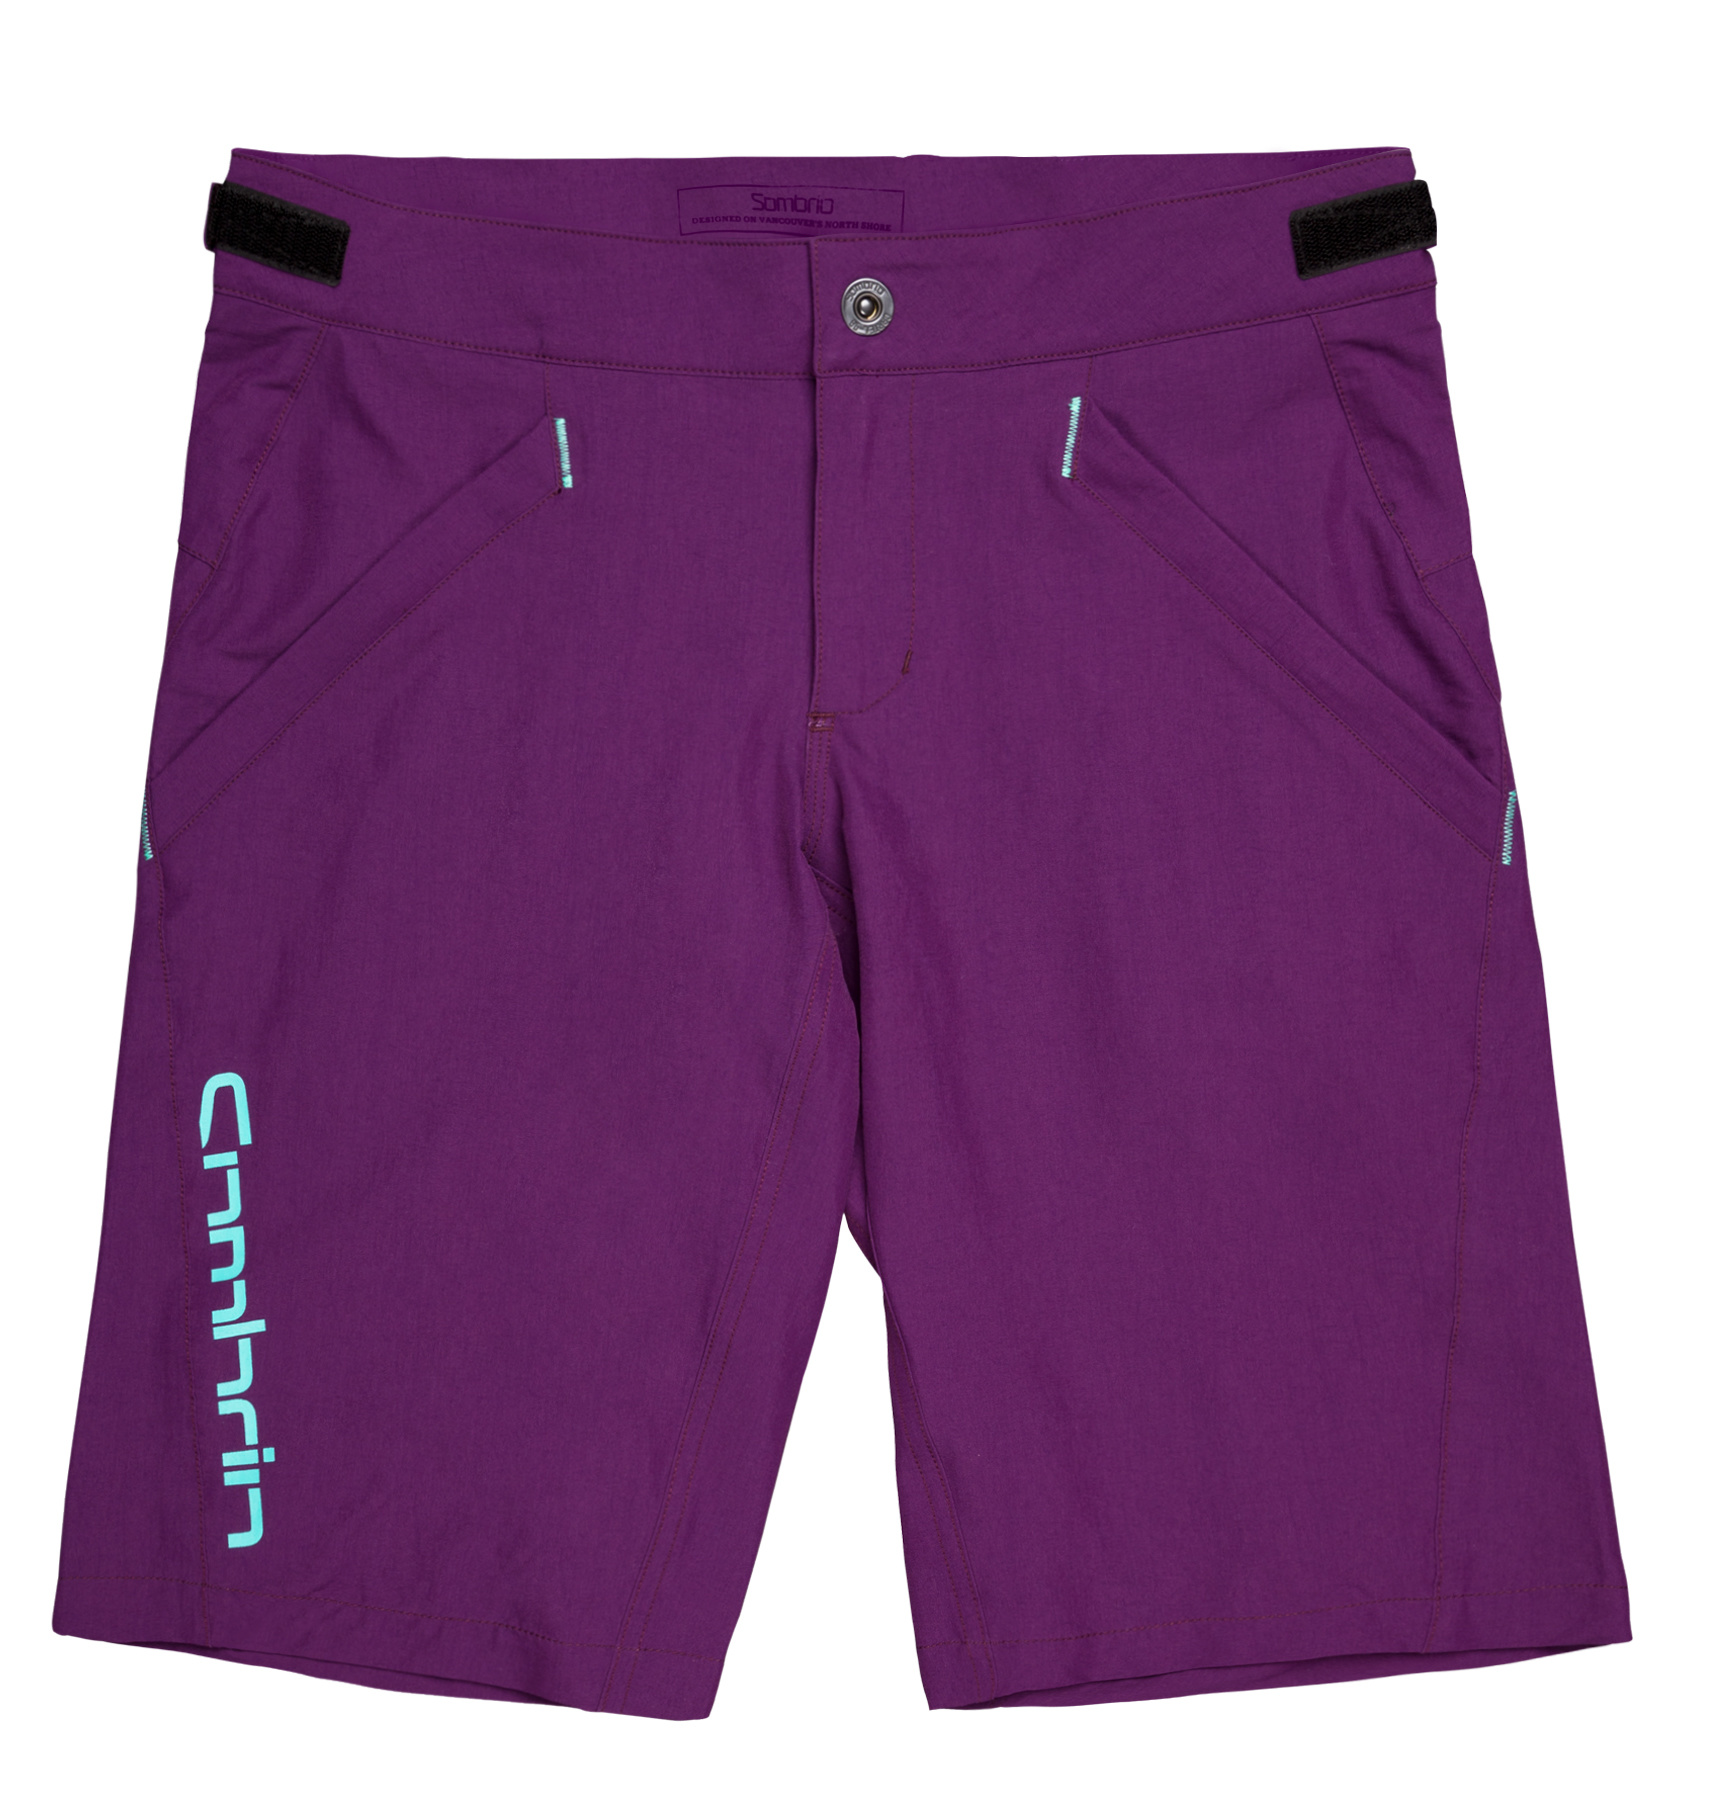 V'al Shorts, Grape L